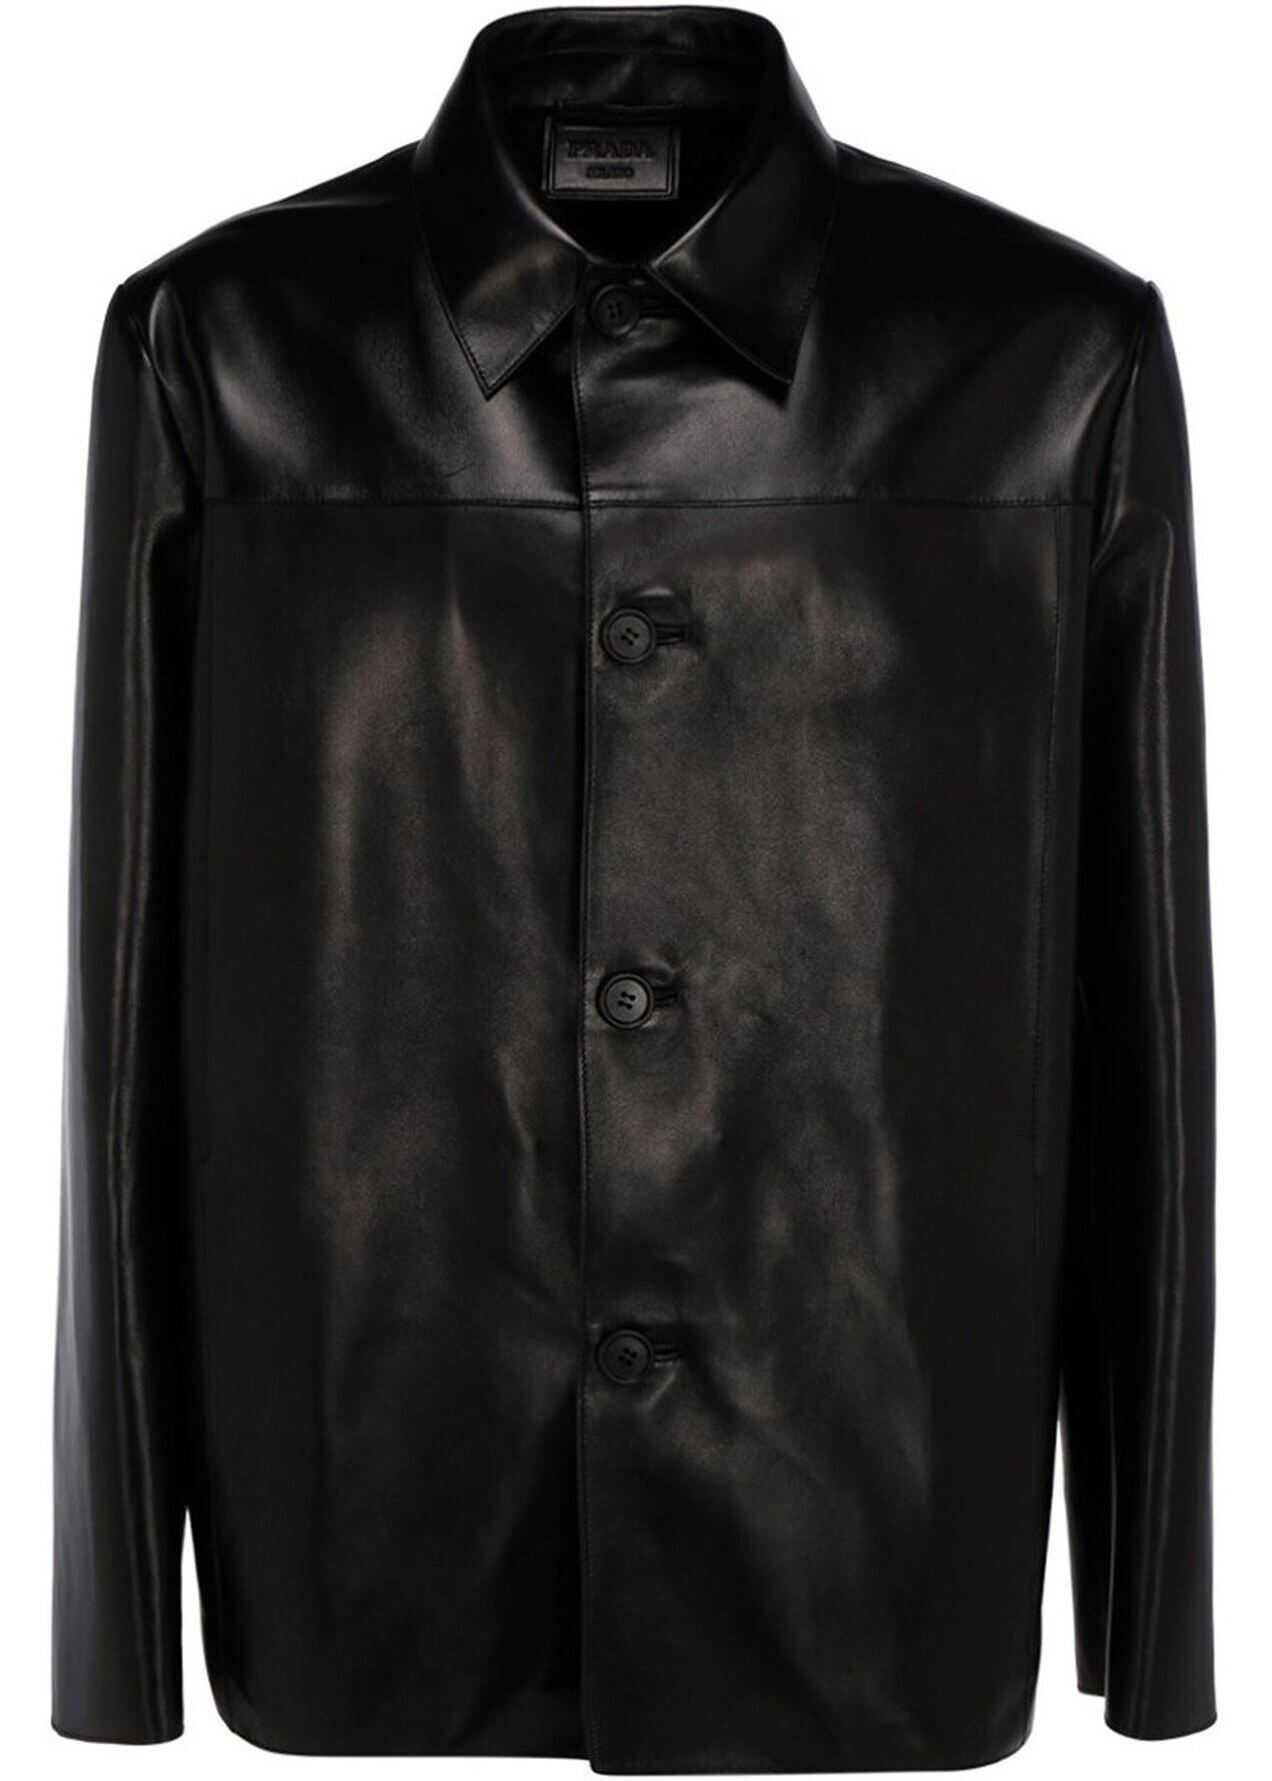 Prada Napa Shirt Jacket In Black Black imagine